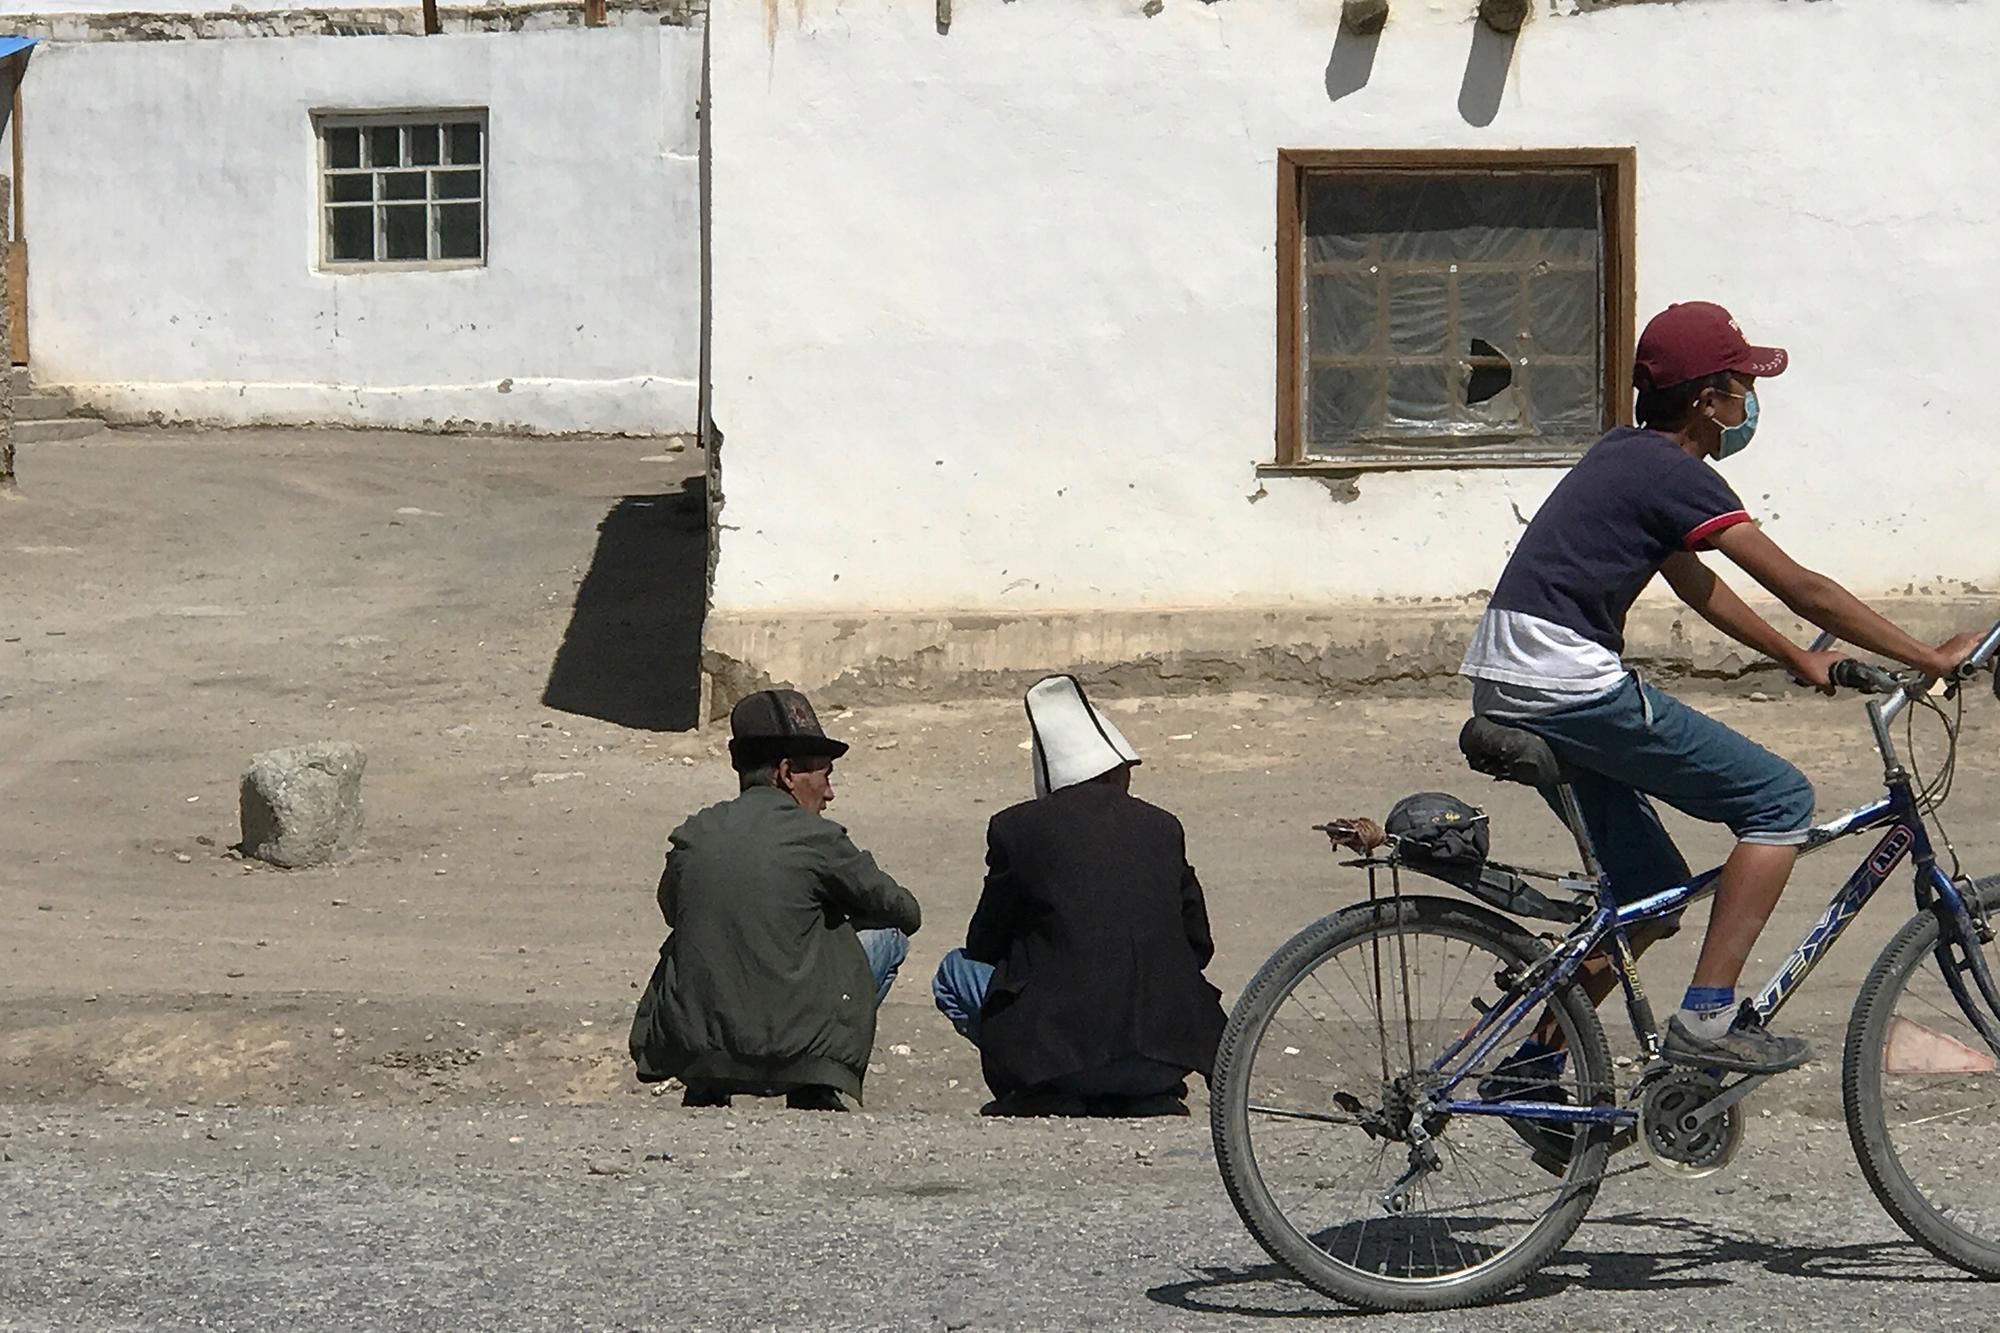 Street scene in Murghab.